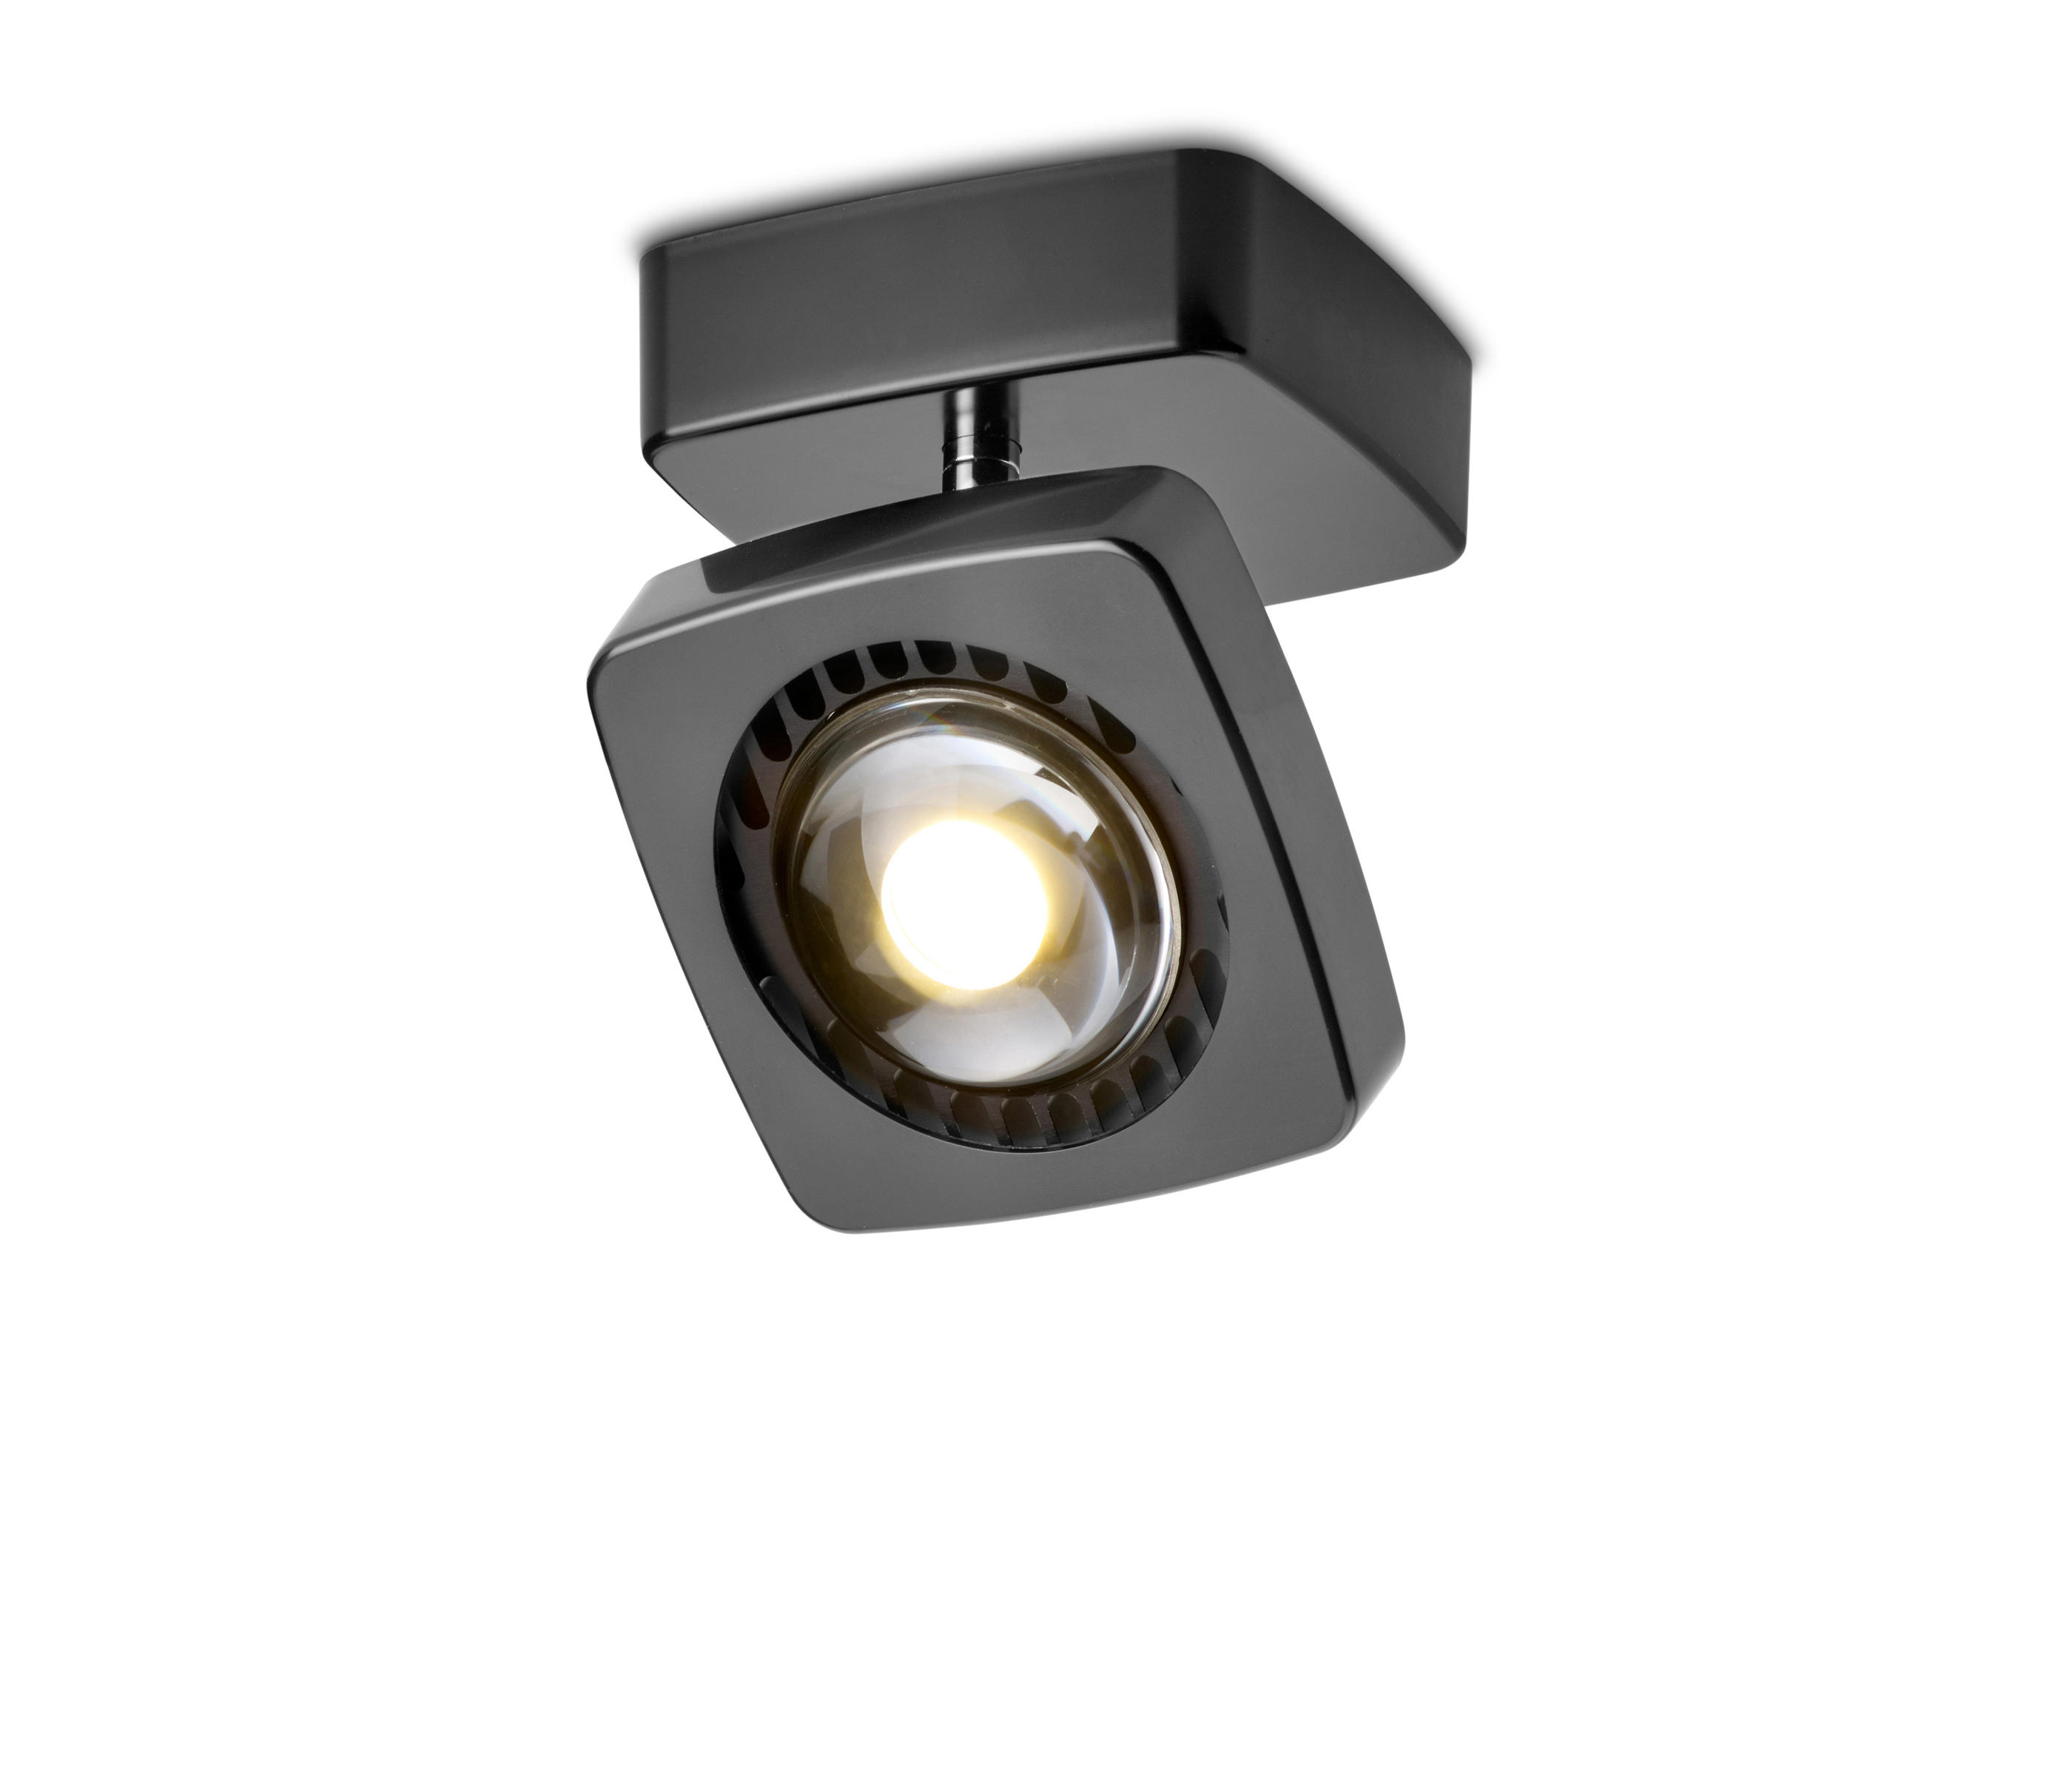 kelveen ceiling luminaire general lighting by oligo. Black Bedroom Furniture Sets. Home Design Ideas